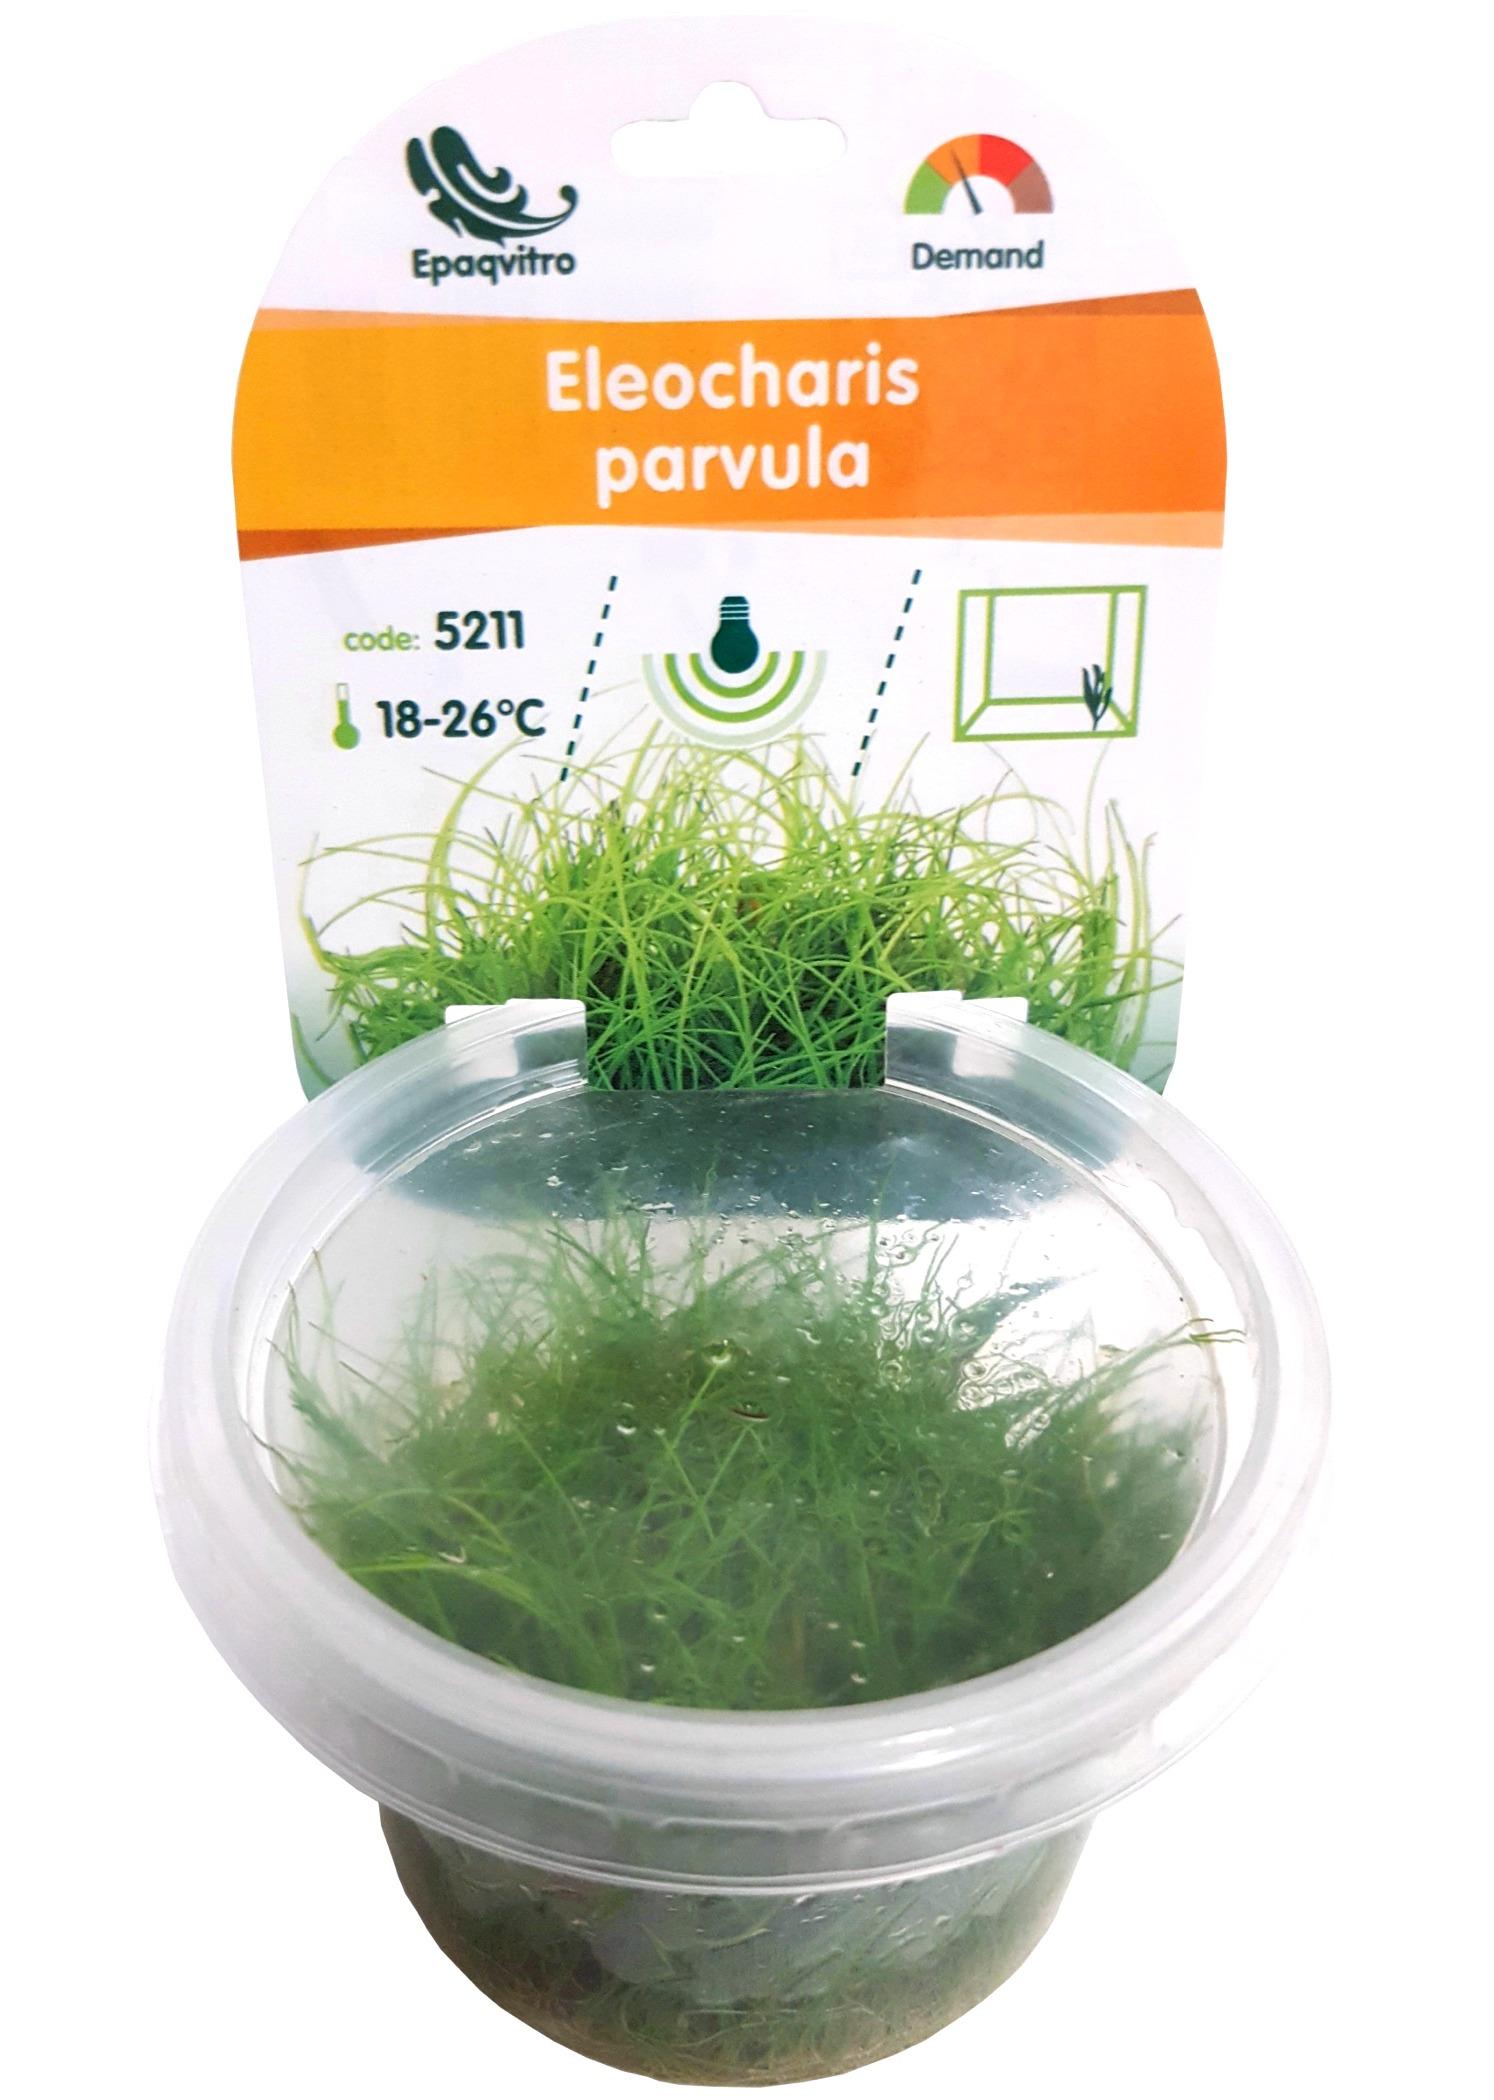 Eleocharis parvula plante d\'aquarium gazonnante qualité Prémium en gobelet In Vitro 100 ml